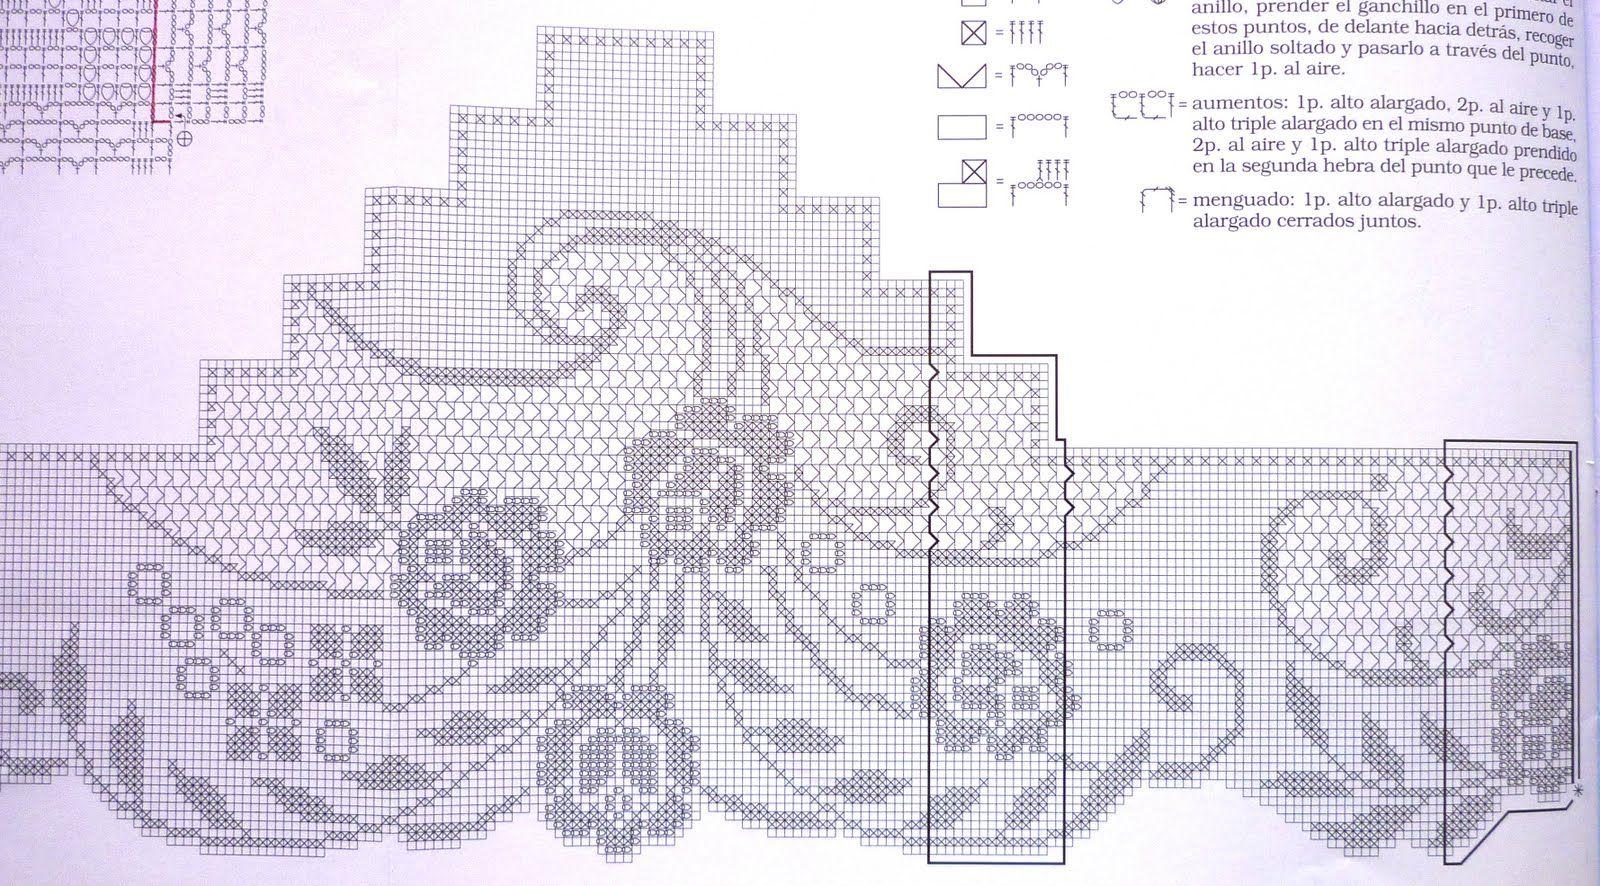 crochet em revista | ŠEME ZA HEKLANjE | Ganchillo, Croché, Bordado